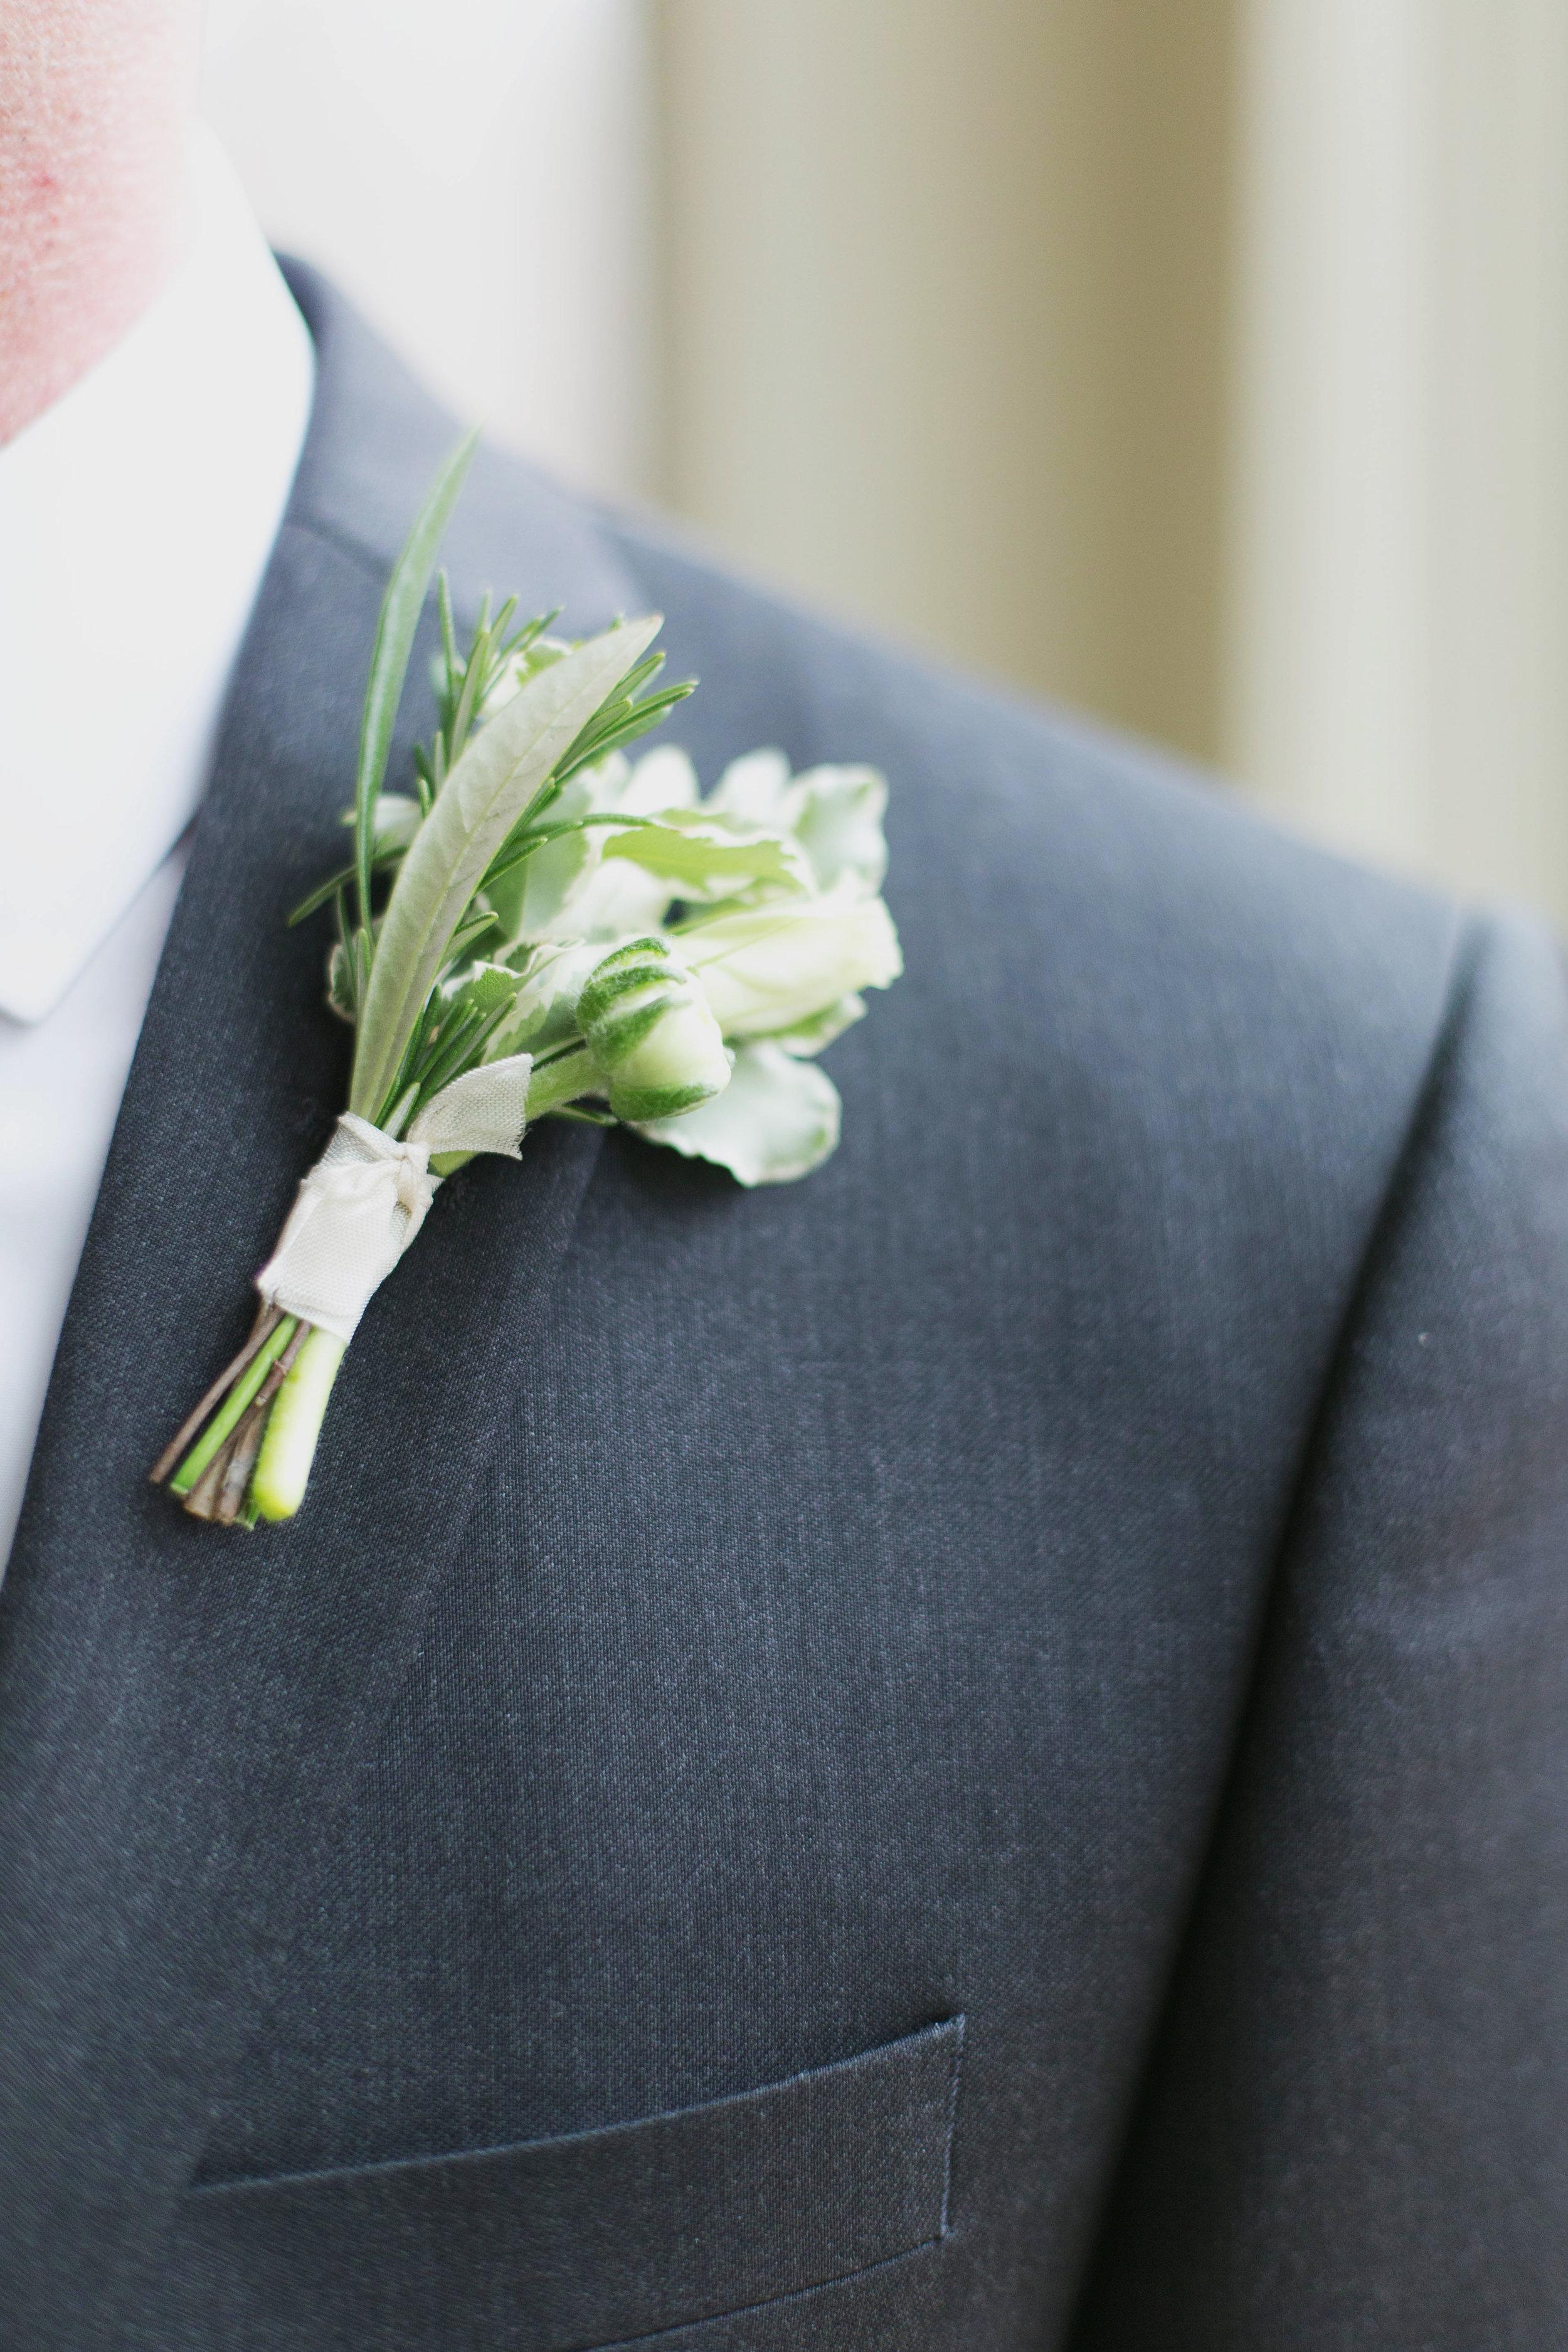 Simply-Charming-Socials_Atlanta-Wedding-Planner_Our-Labor-Of-Love_Emily-and-Jon_4.jpg